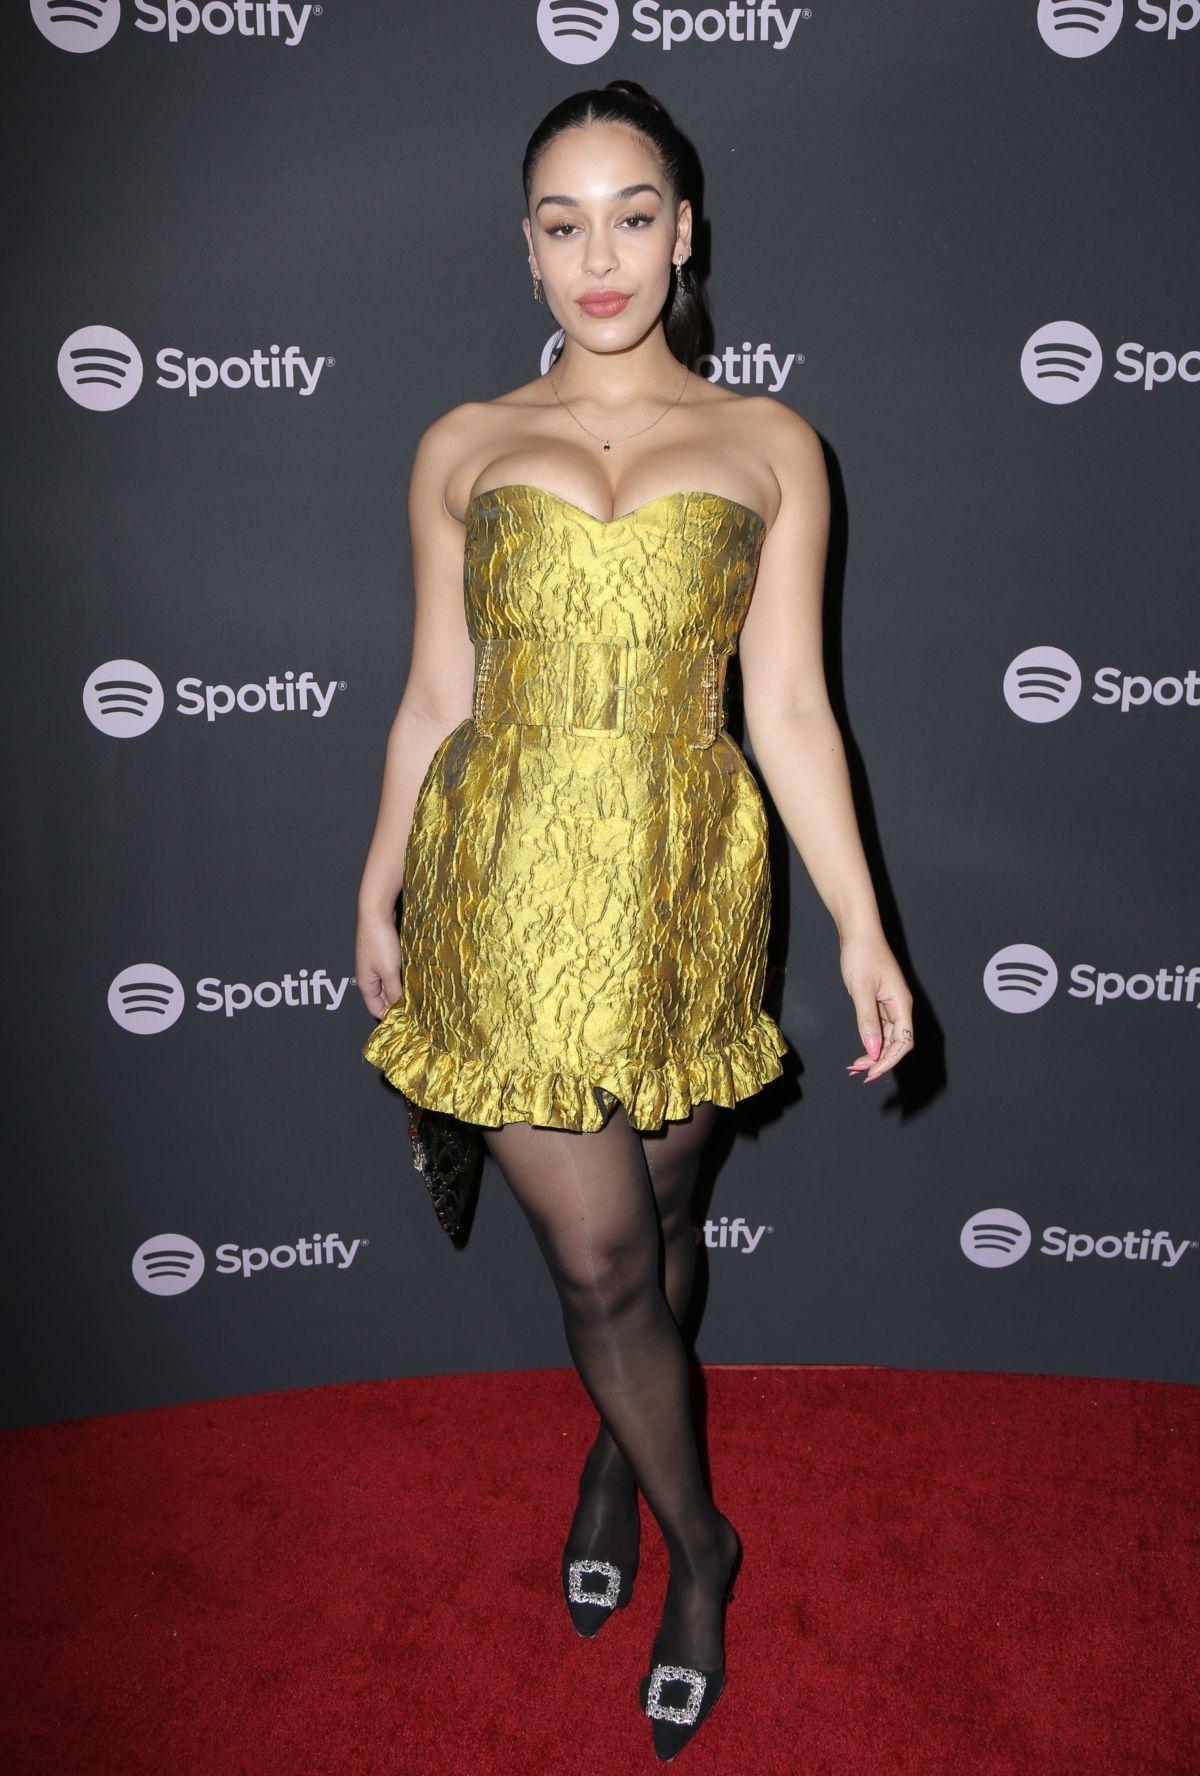 JORJA SMITH at Spotify Best New Artist 2019 in Los Angeles